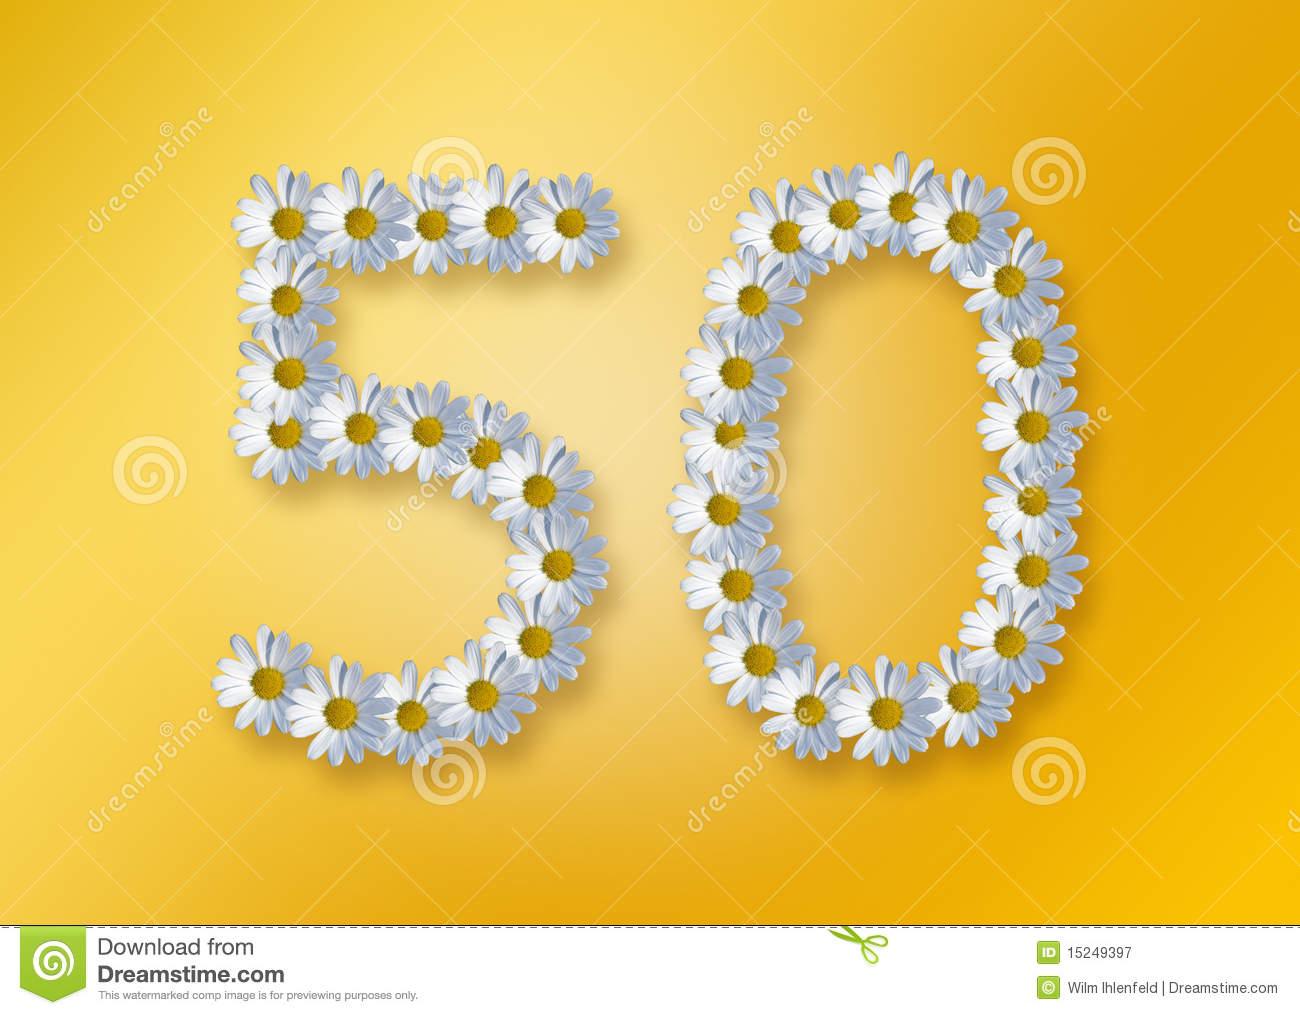 Clipart 50 geburtstag einladung vector black and white stock 50th Birthday Party Invitation Stock Image - Image: 10567321 vector black and white stock